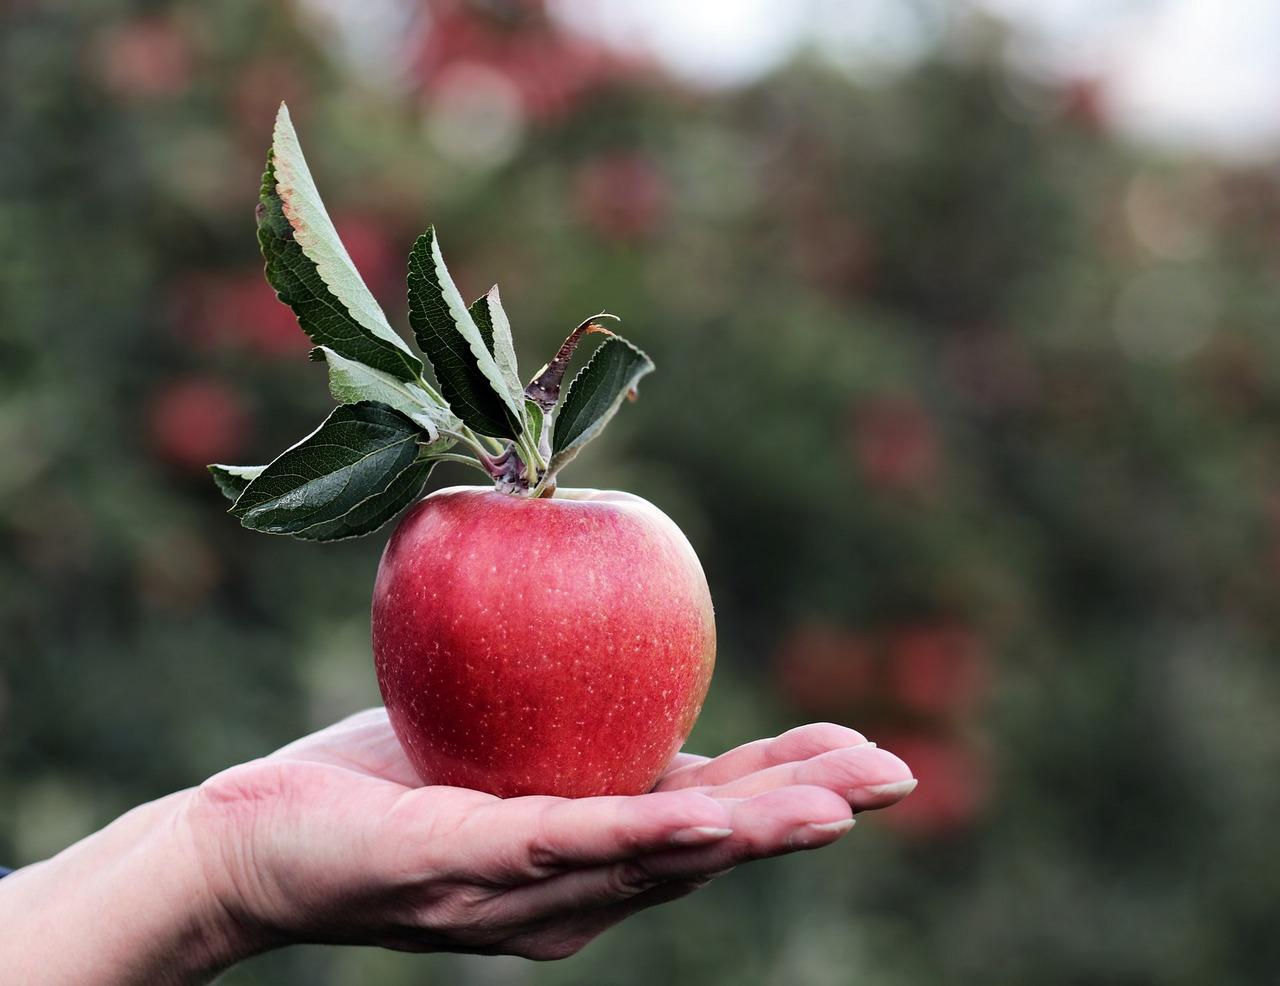 Яблоко на ладони